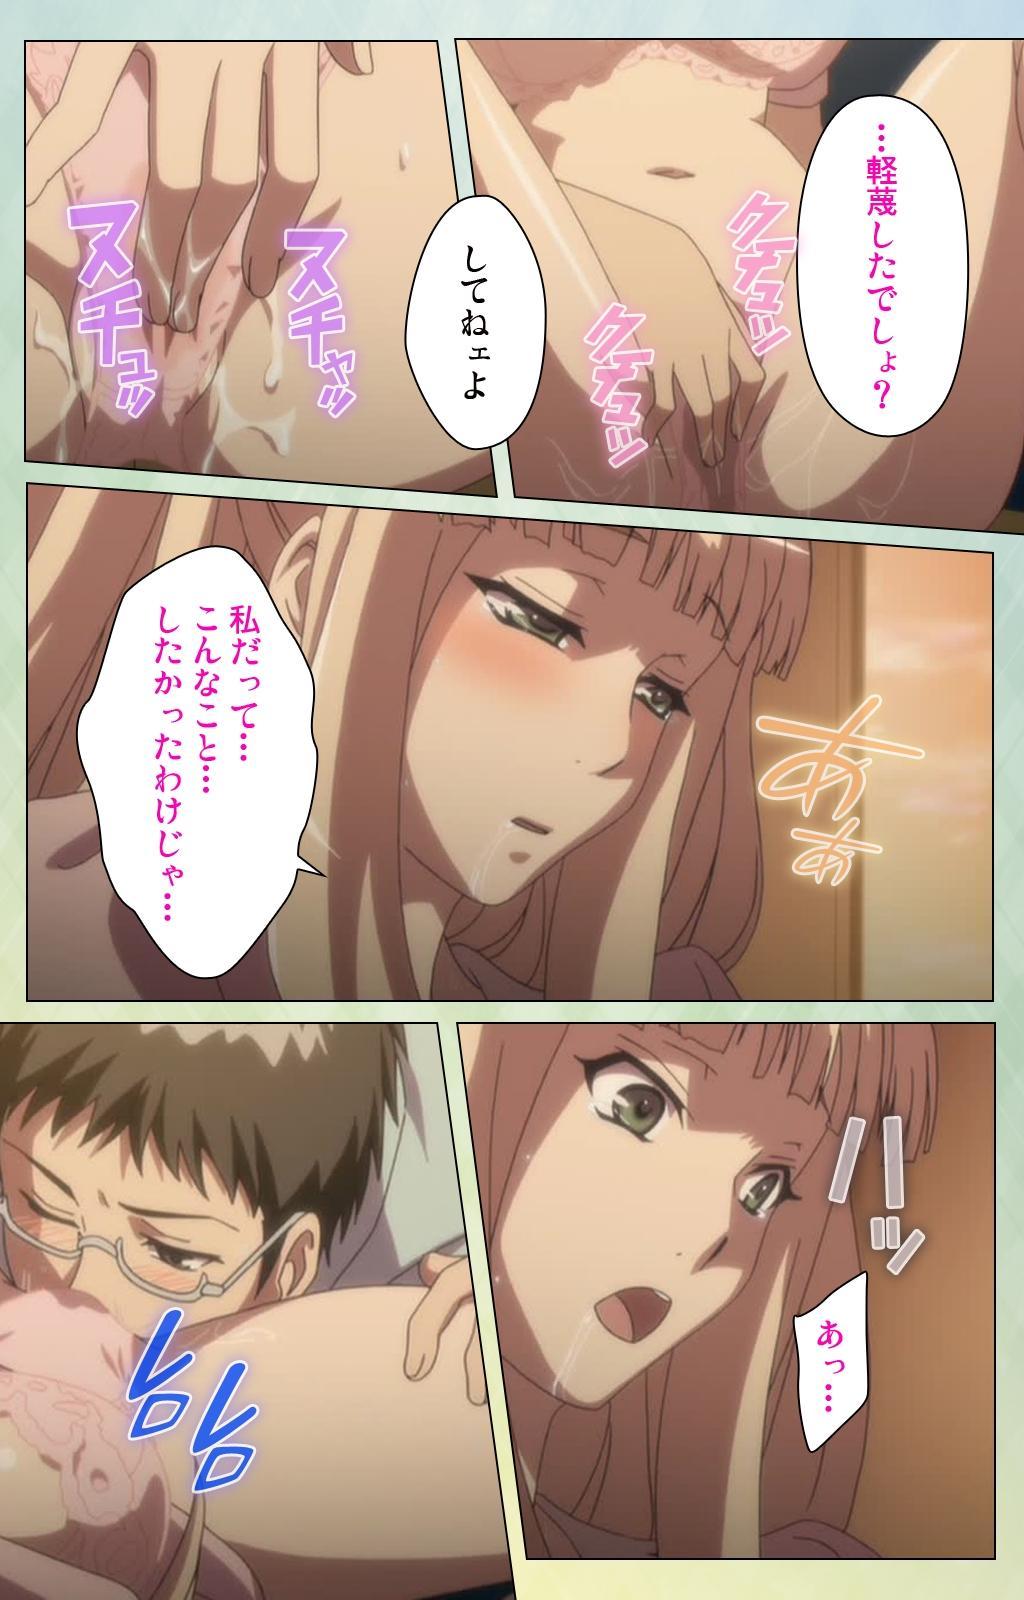 Furueru Kuchibiru fuzzy lips1 Complete Ban 61